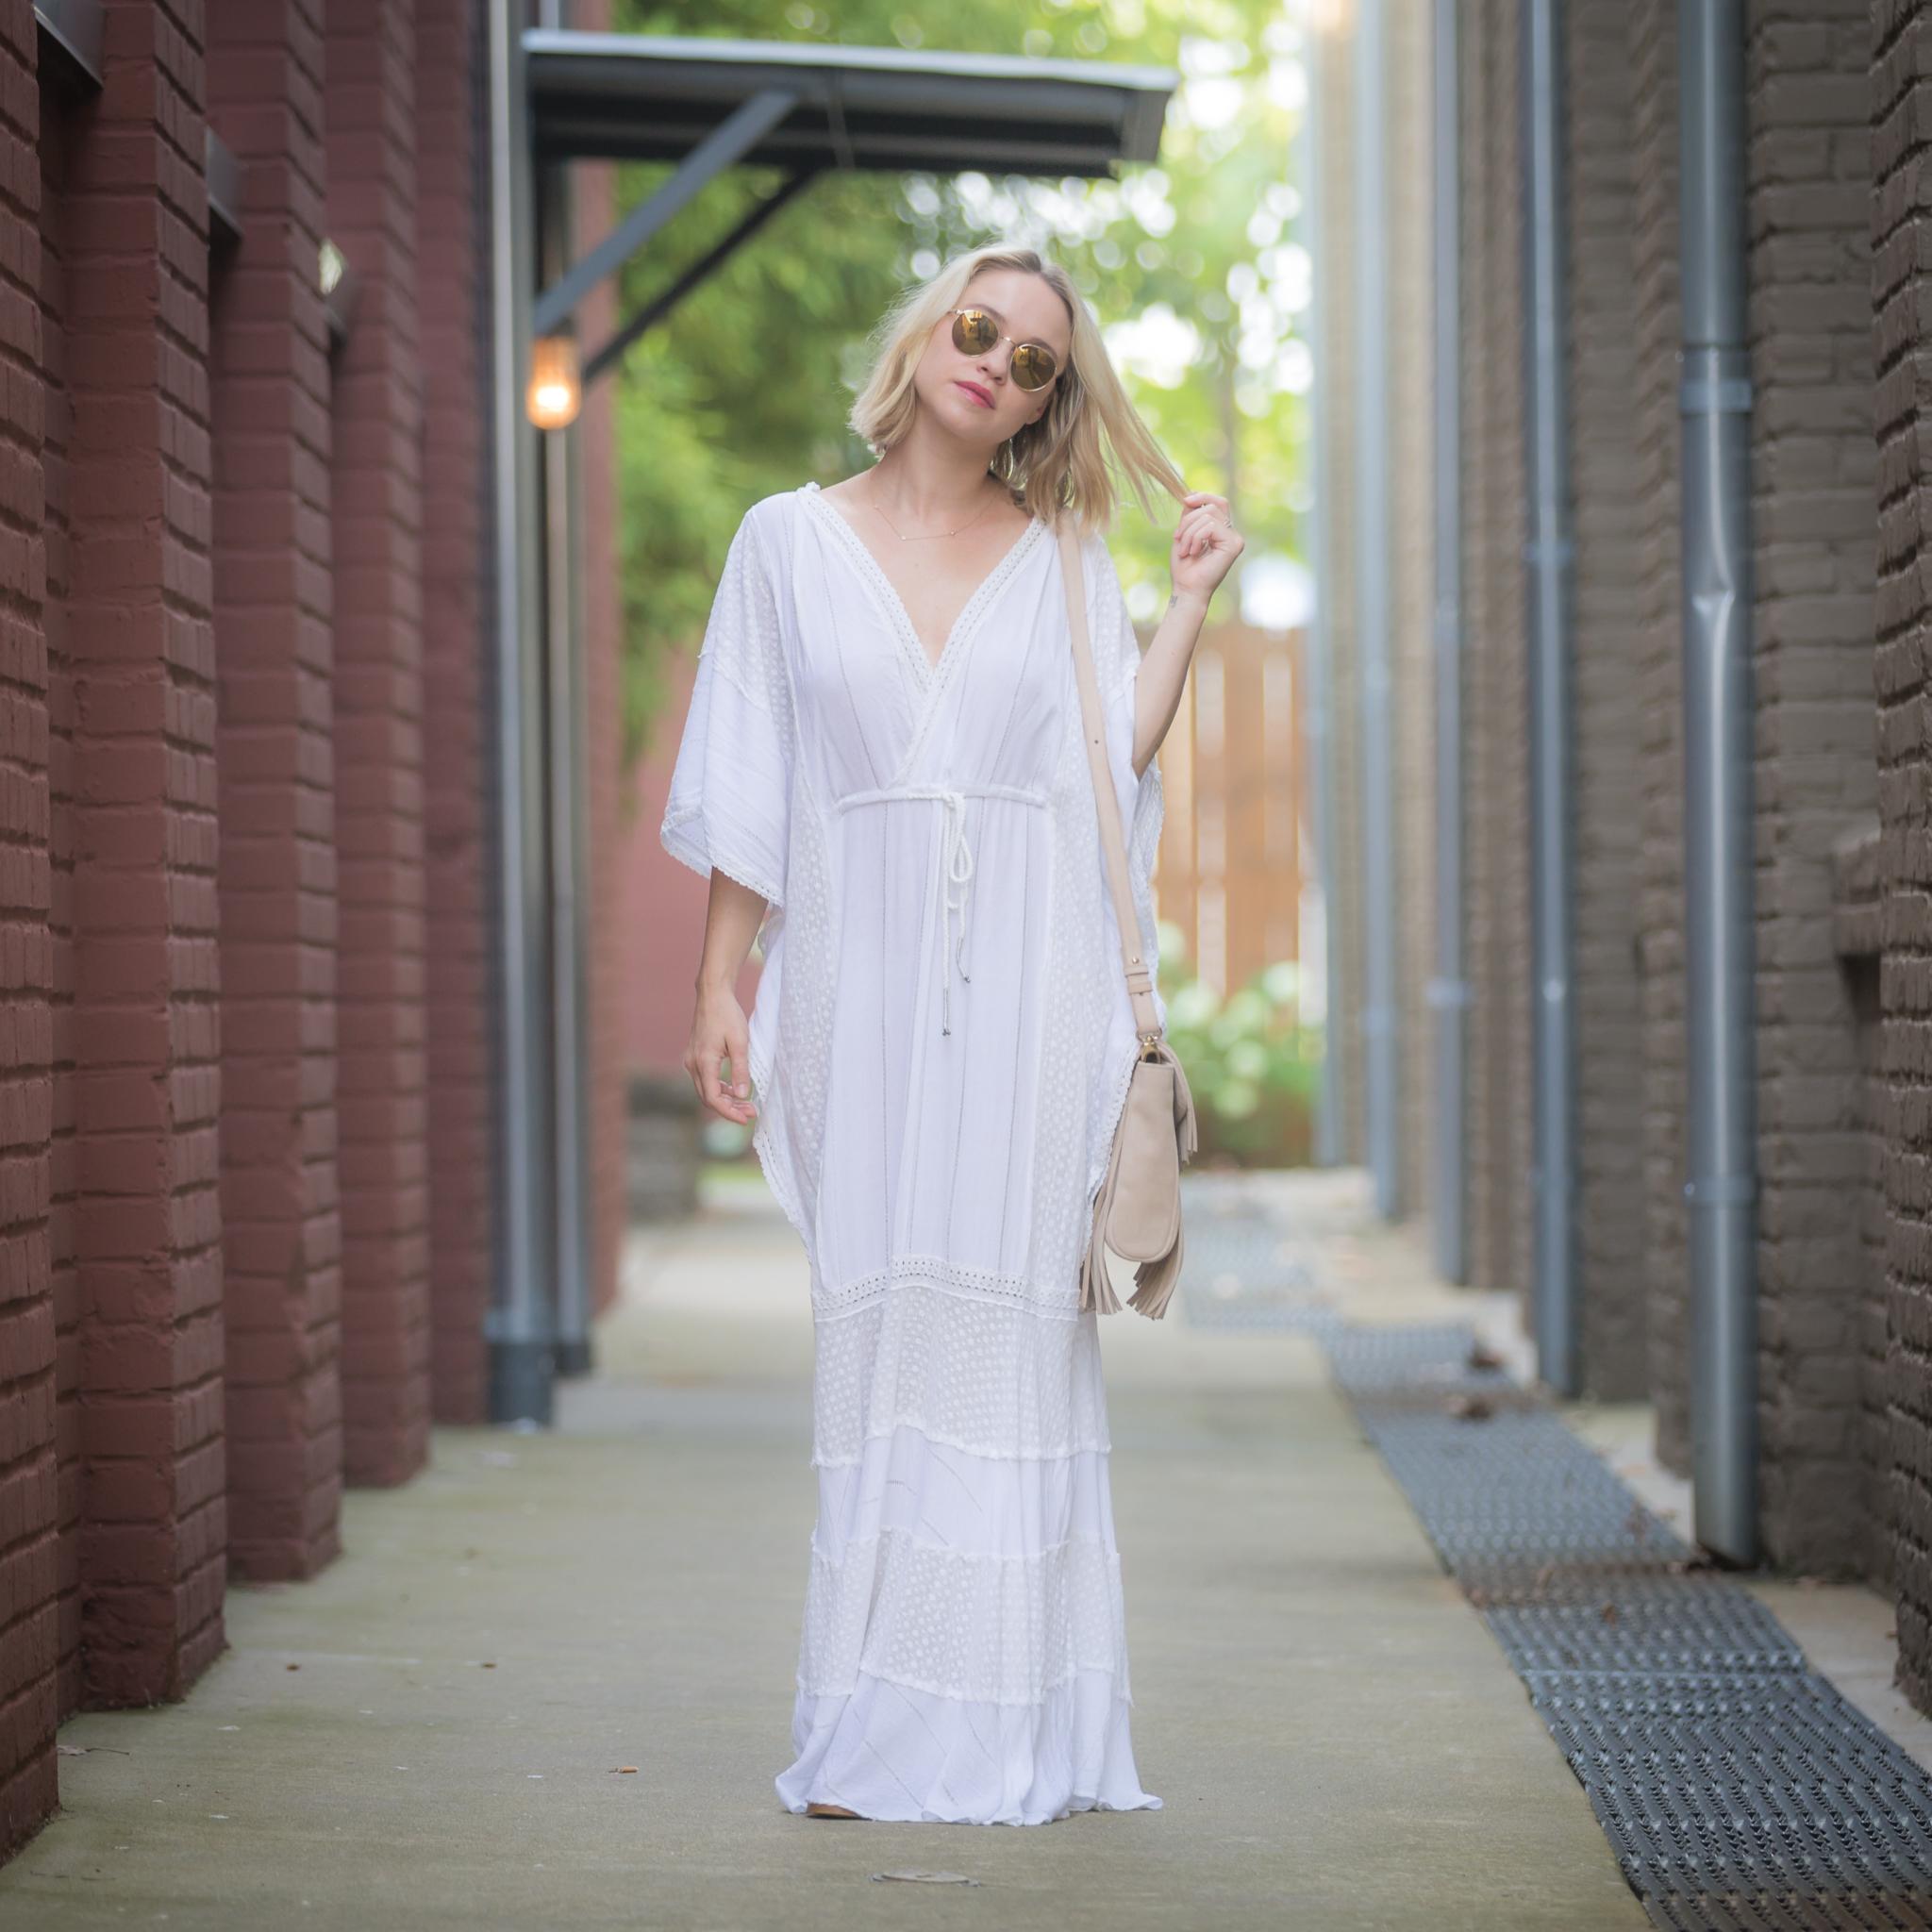 Becca-Tobin-iWally-July2015-2.jpg